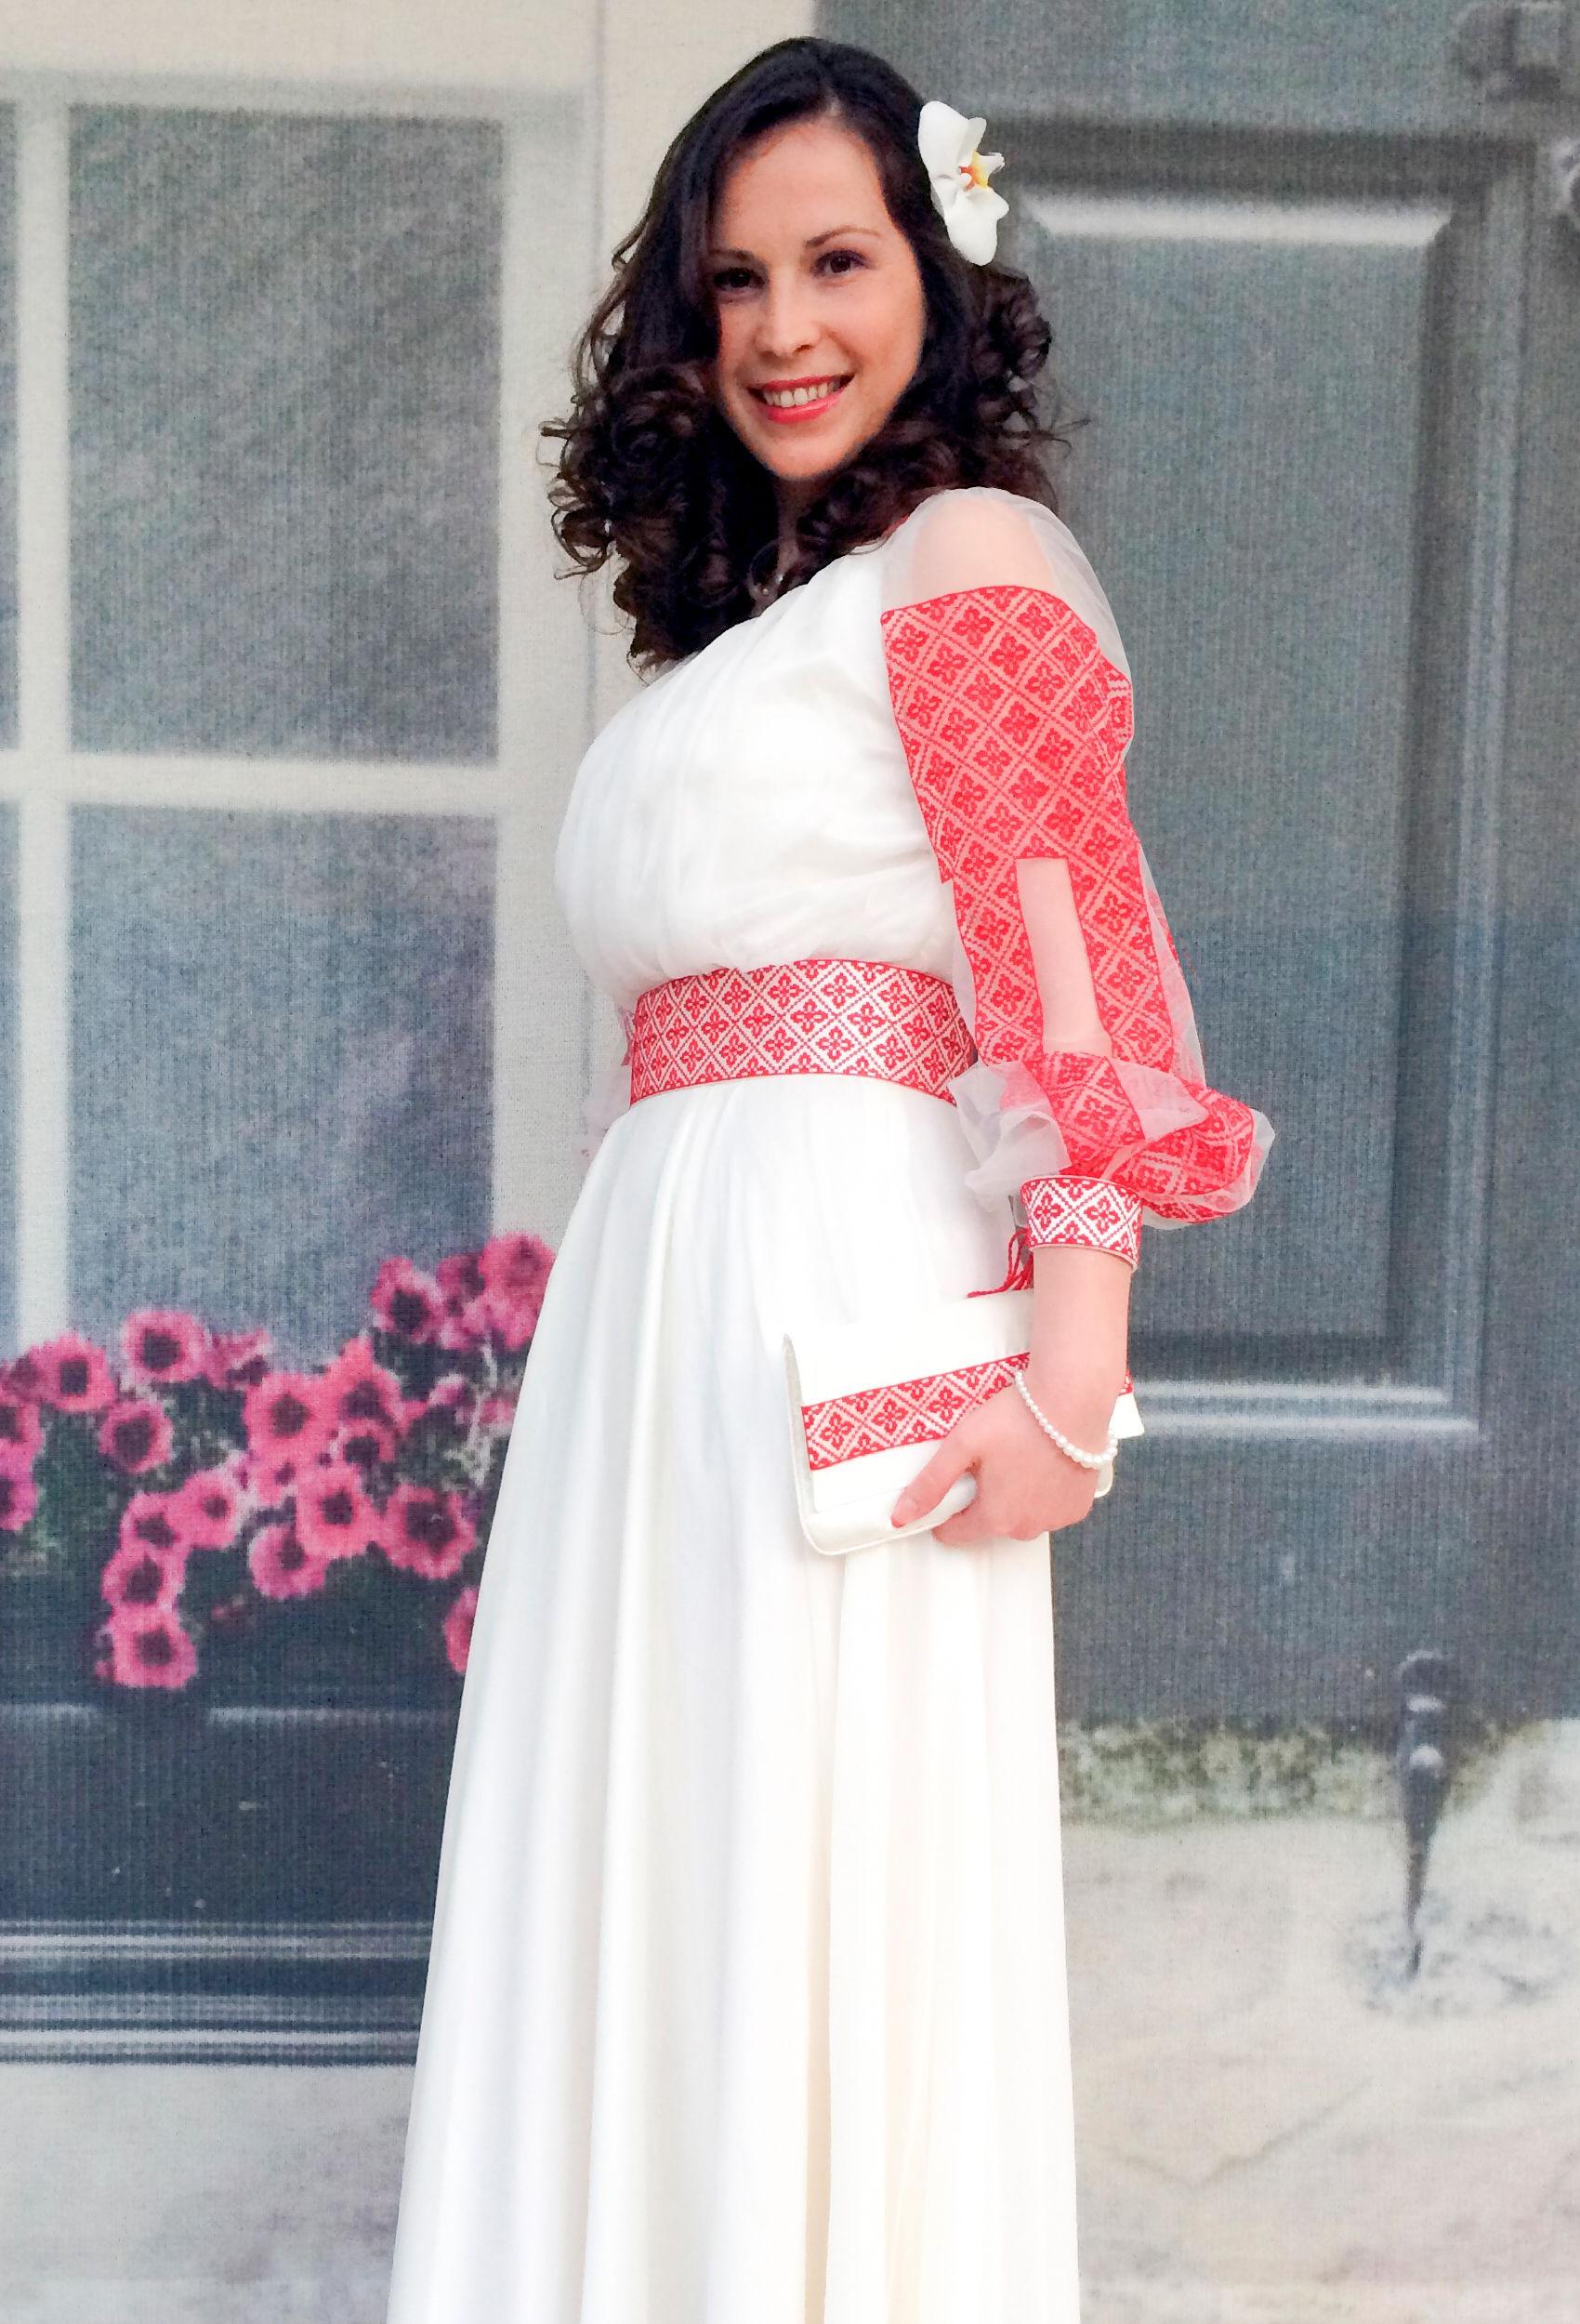 Rochie Mihaela Pentru Nunta Traditionala Romaneasca Costume Ii Si